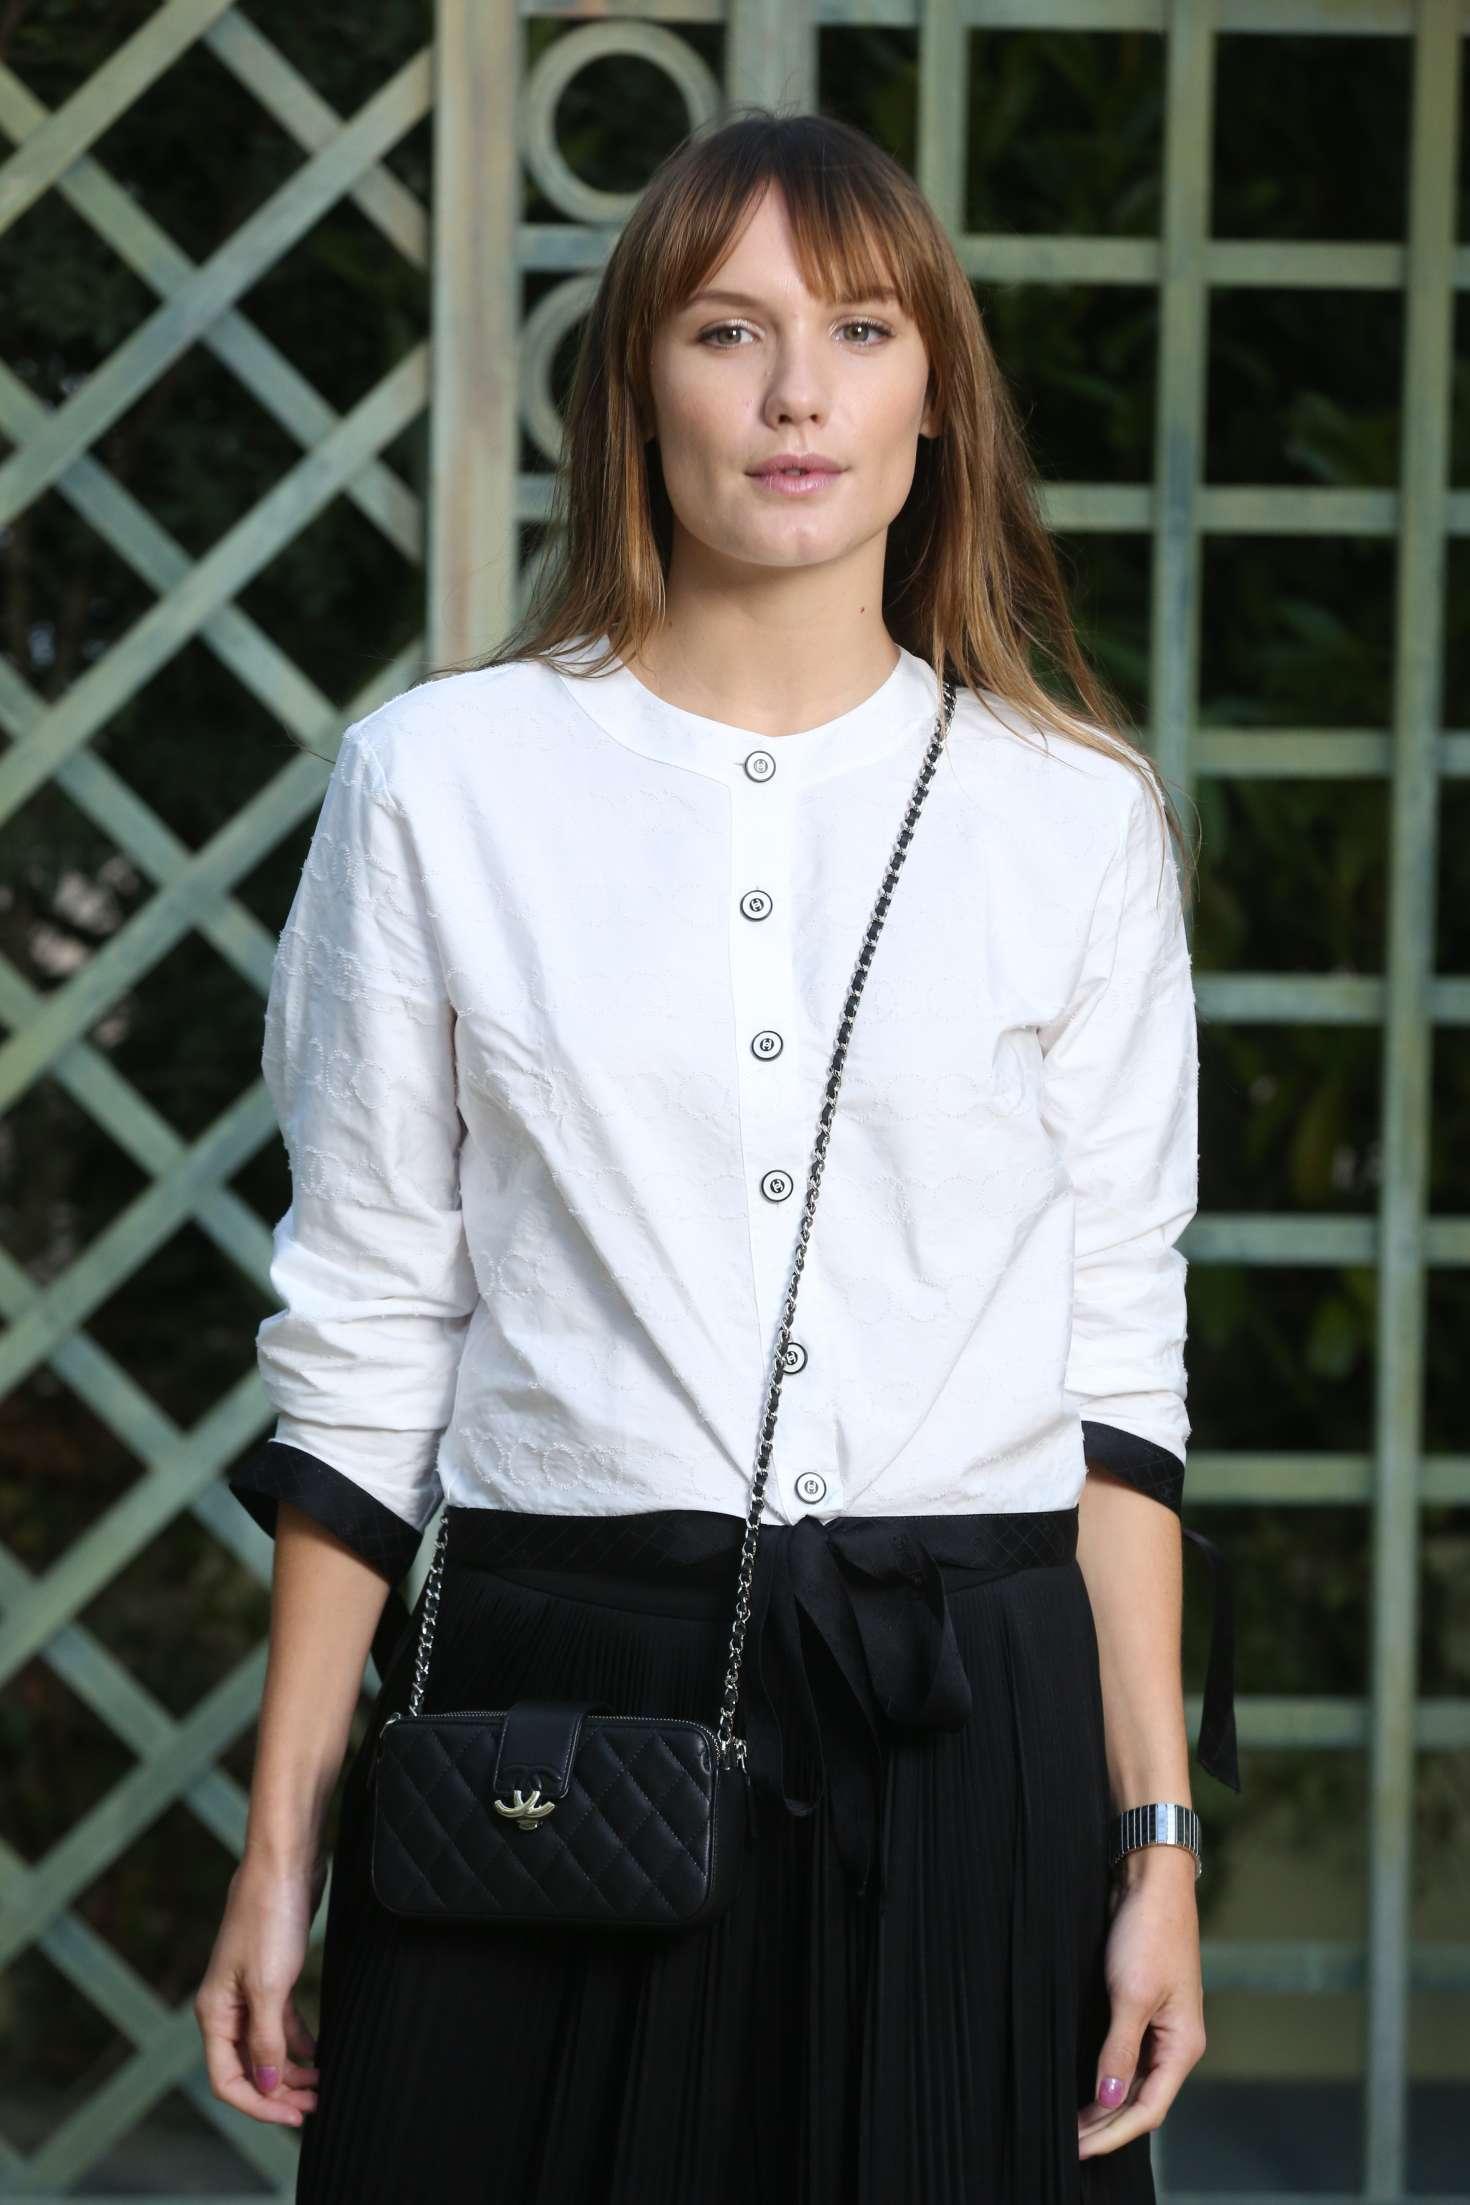 Anna Girardot - Chanel Haute Couture SS 2018 Show in Paris